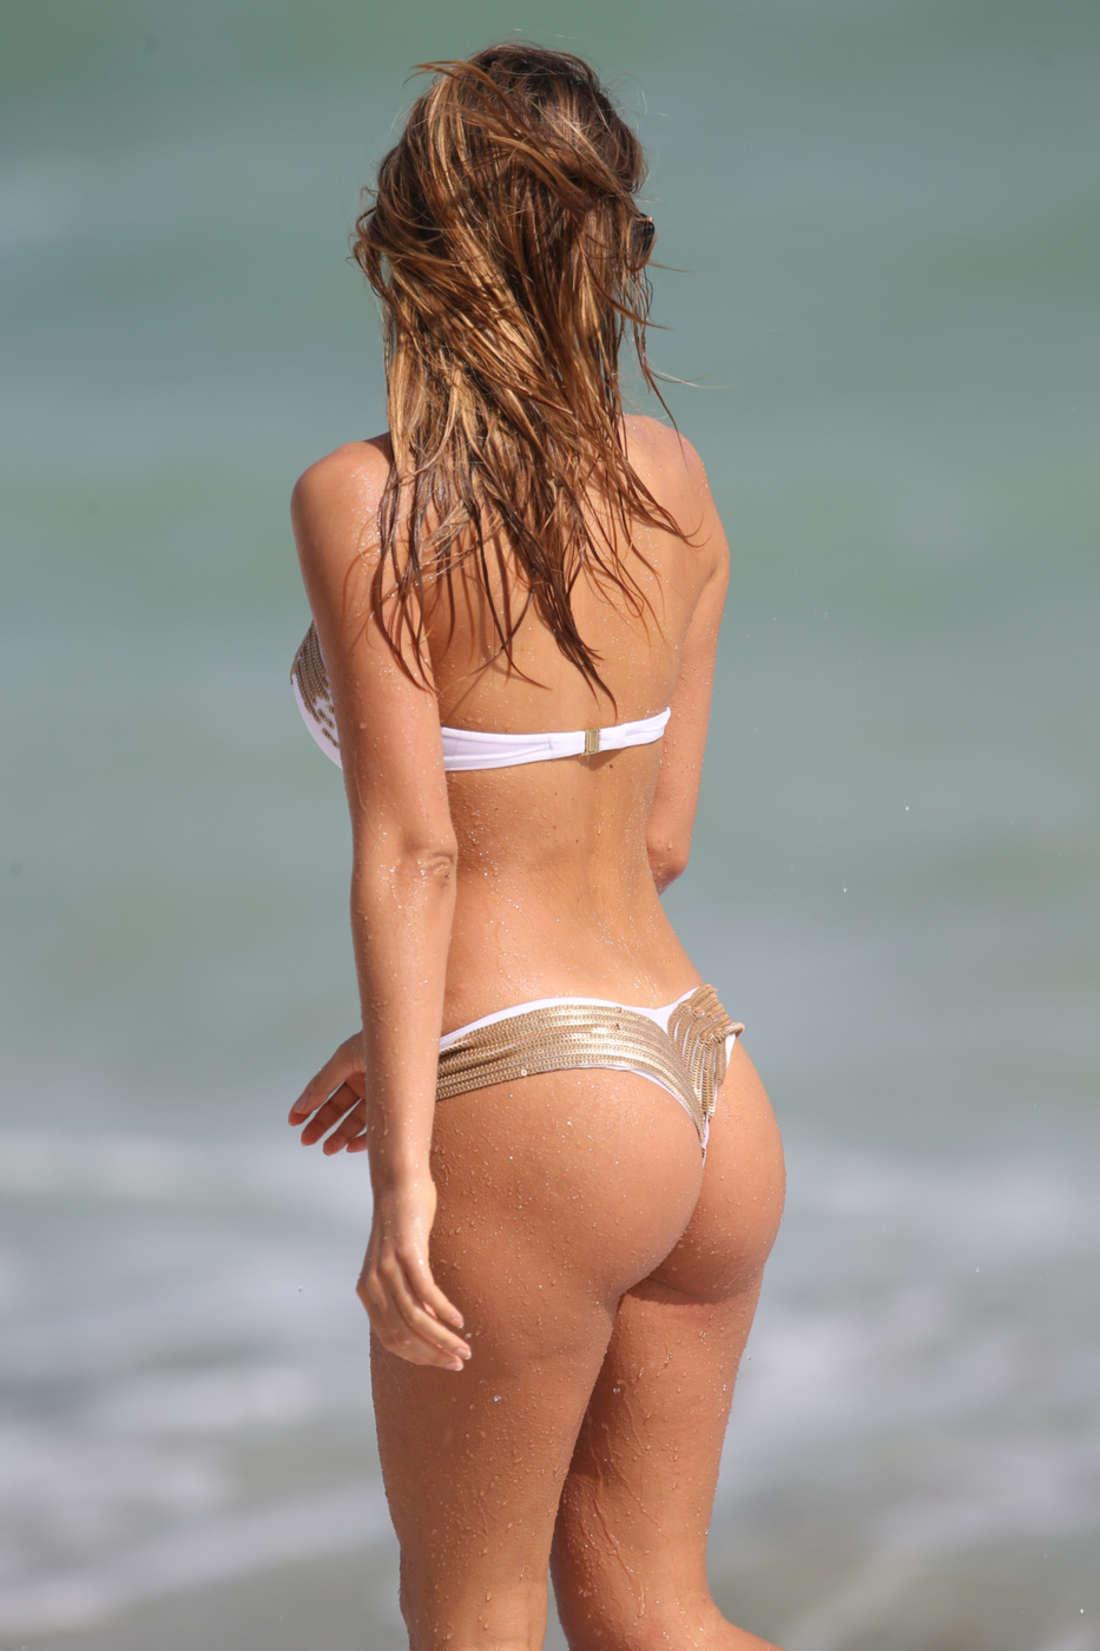 Melissa Castagnoli nude (78 pictures), hot Feet, Instagram, butt 2018